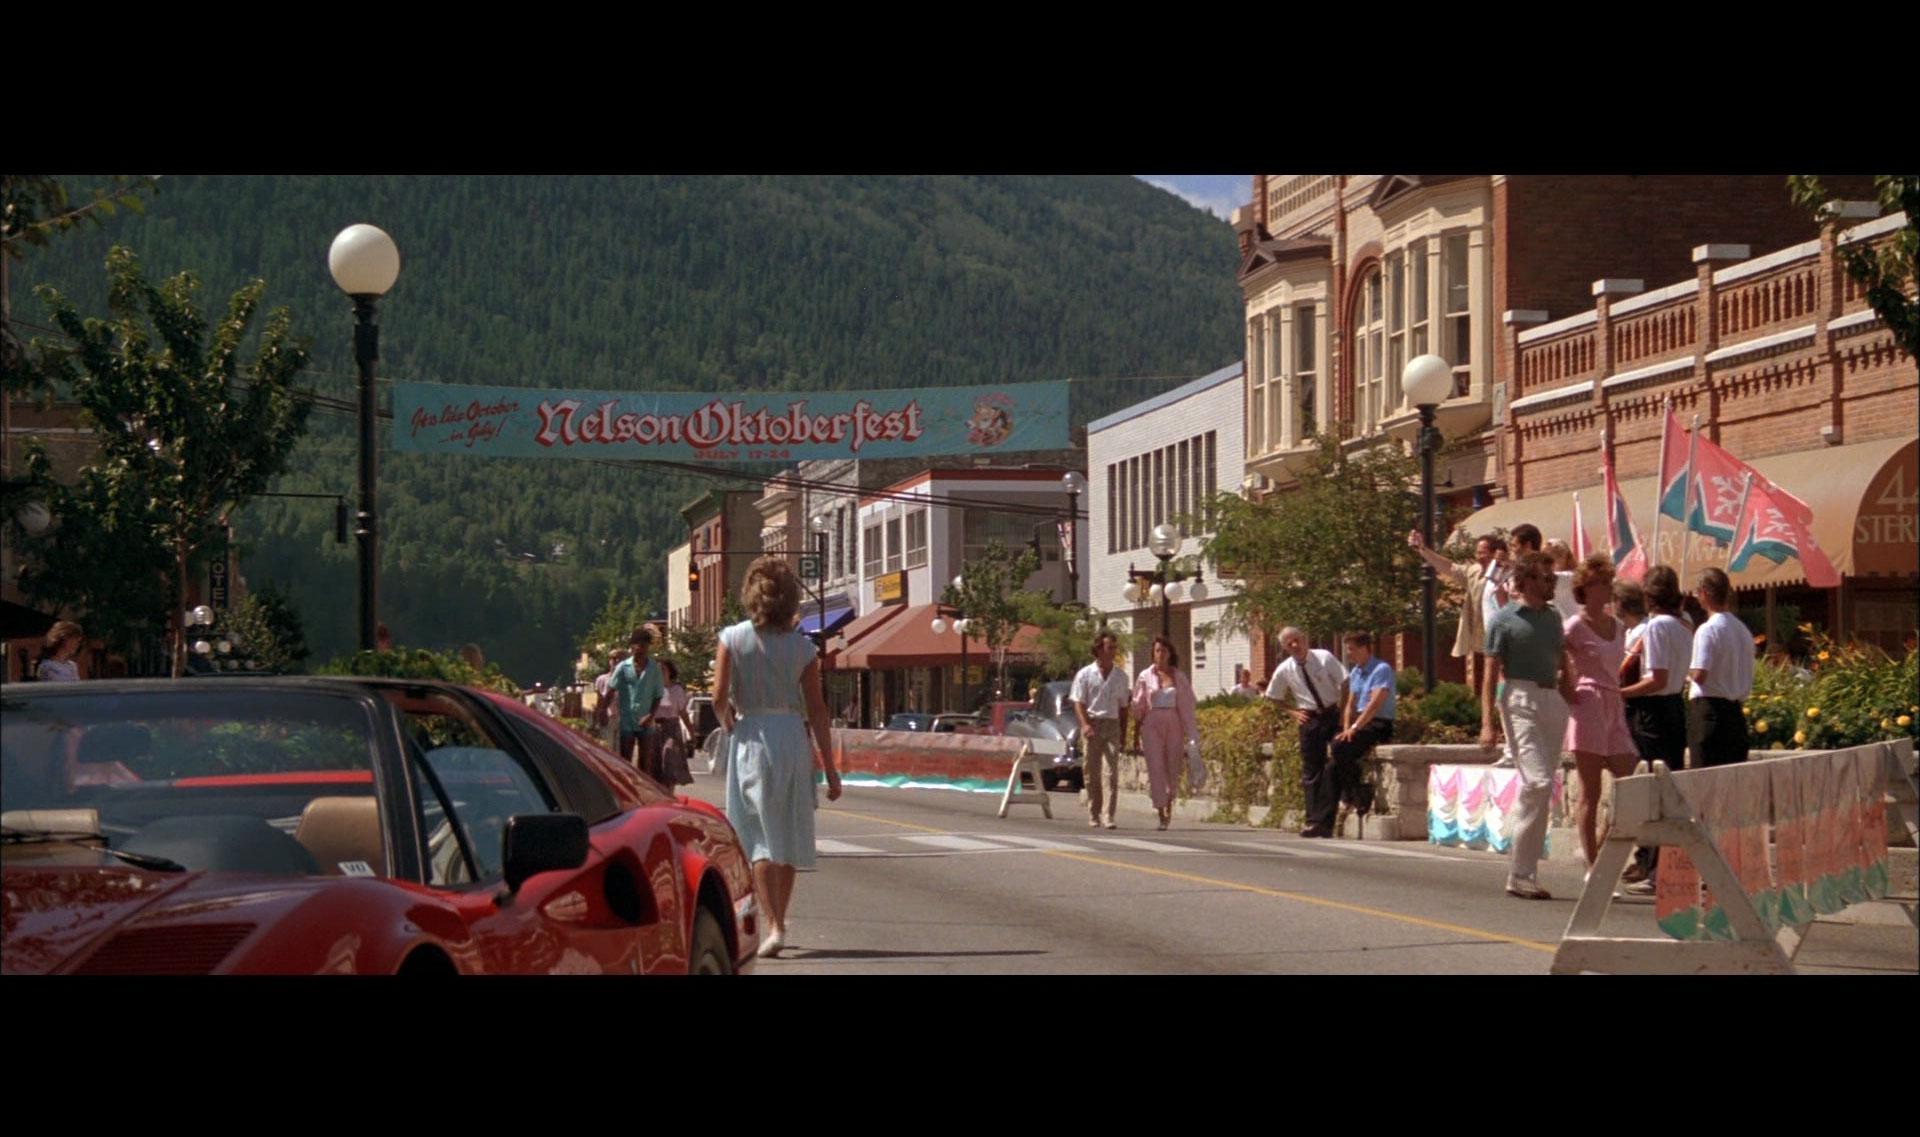 Roxanne Film Screen Shot, Nelson British Columbia